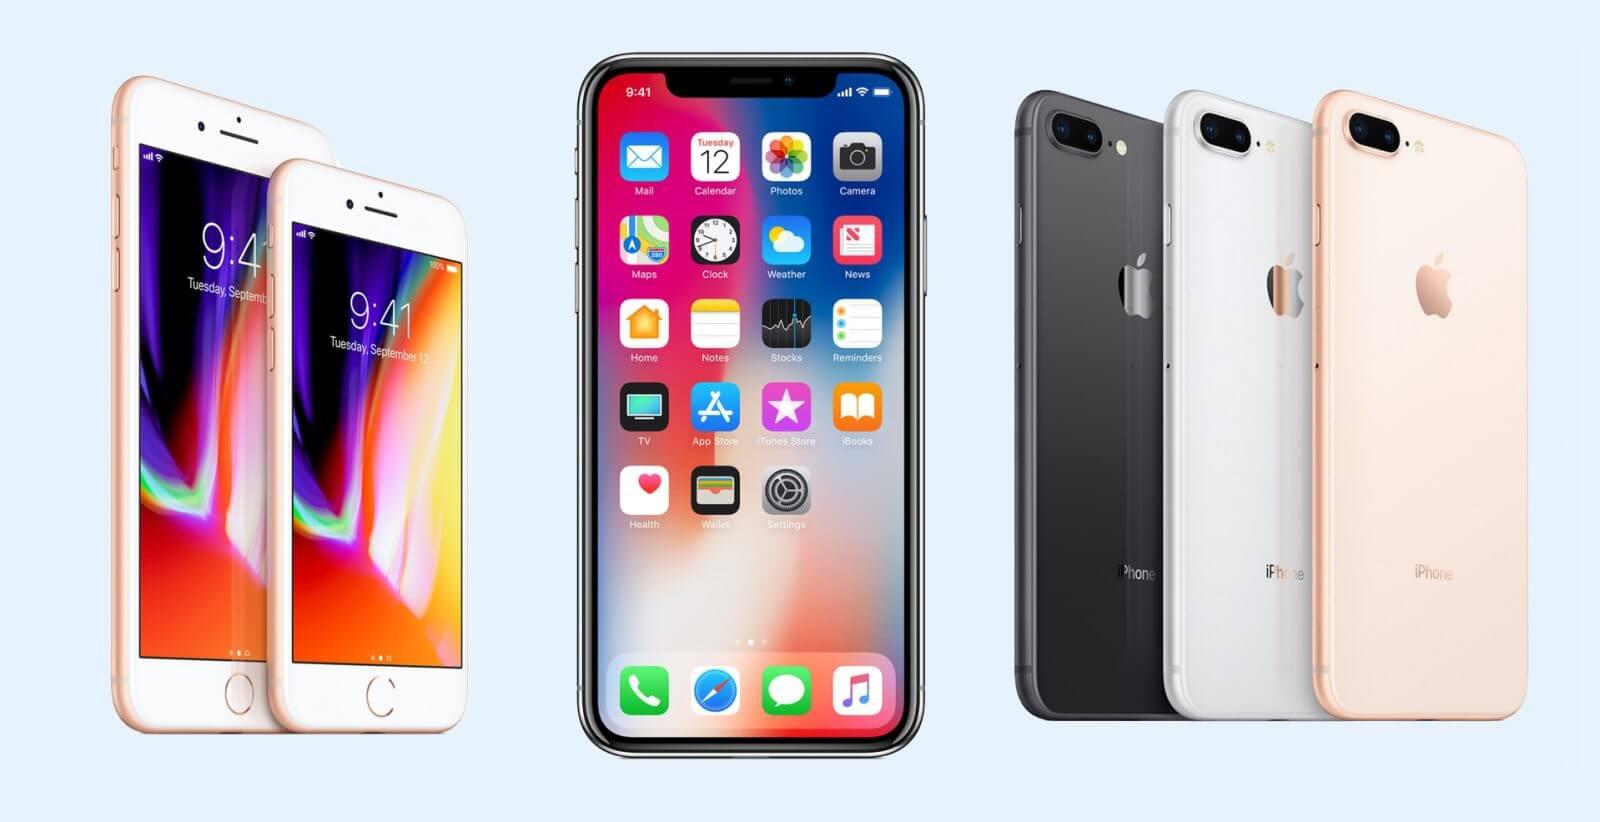 iPhone X- iPhone zilsesi, iPhone X zil sesi